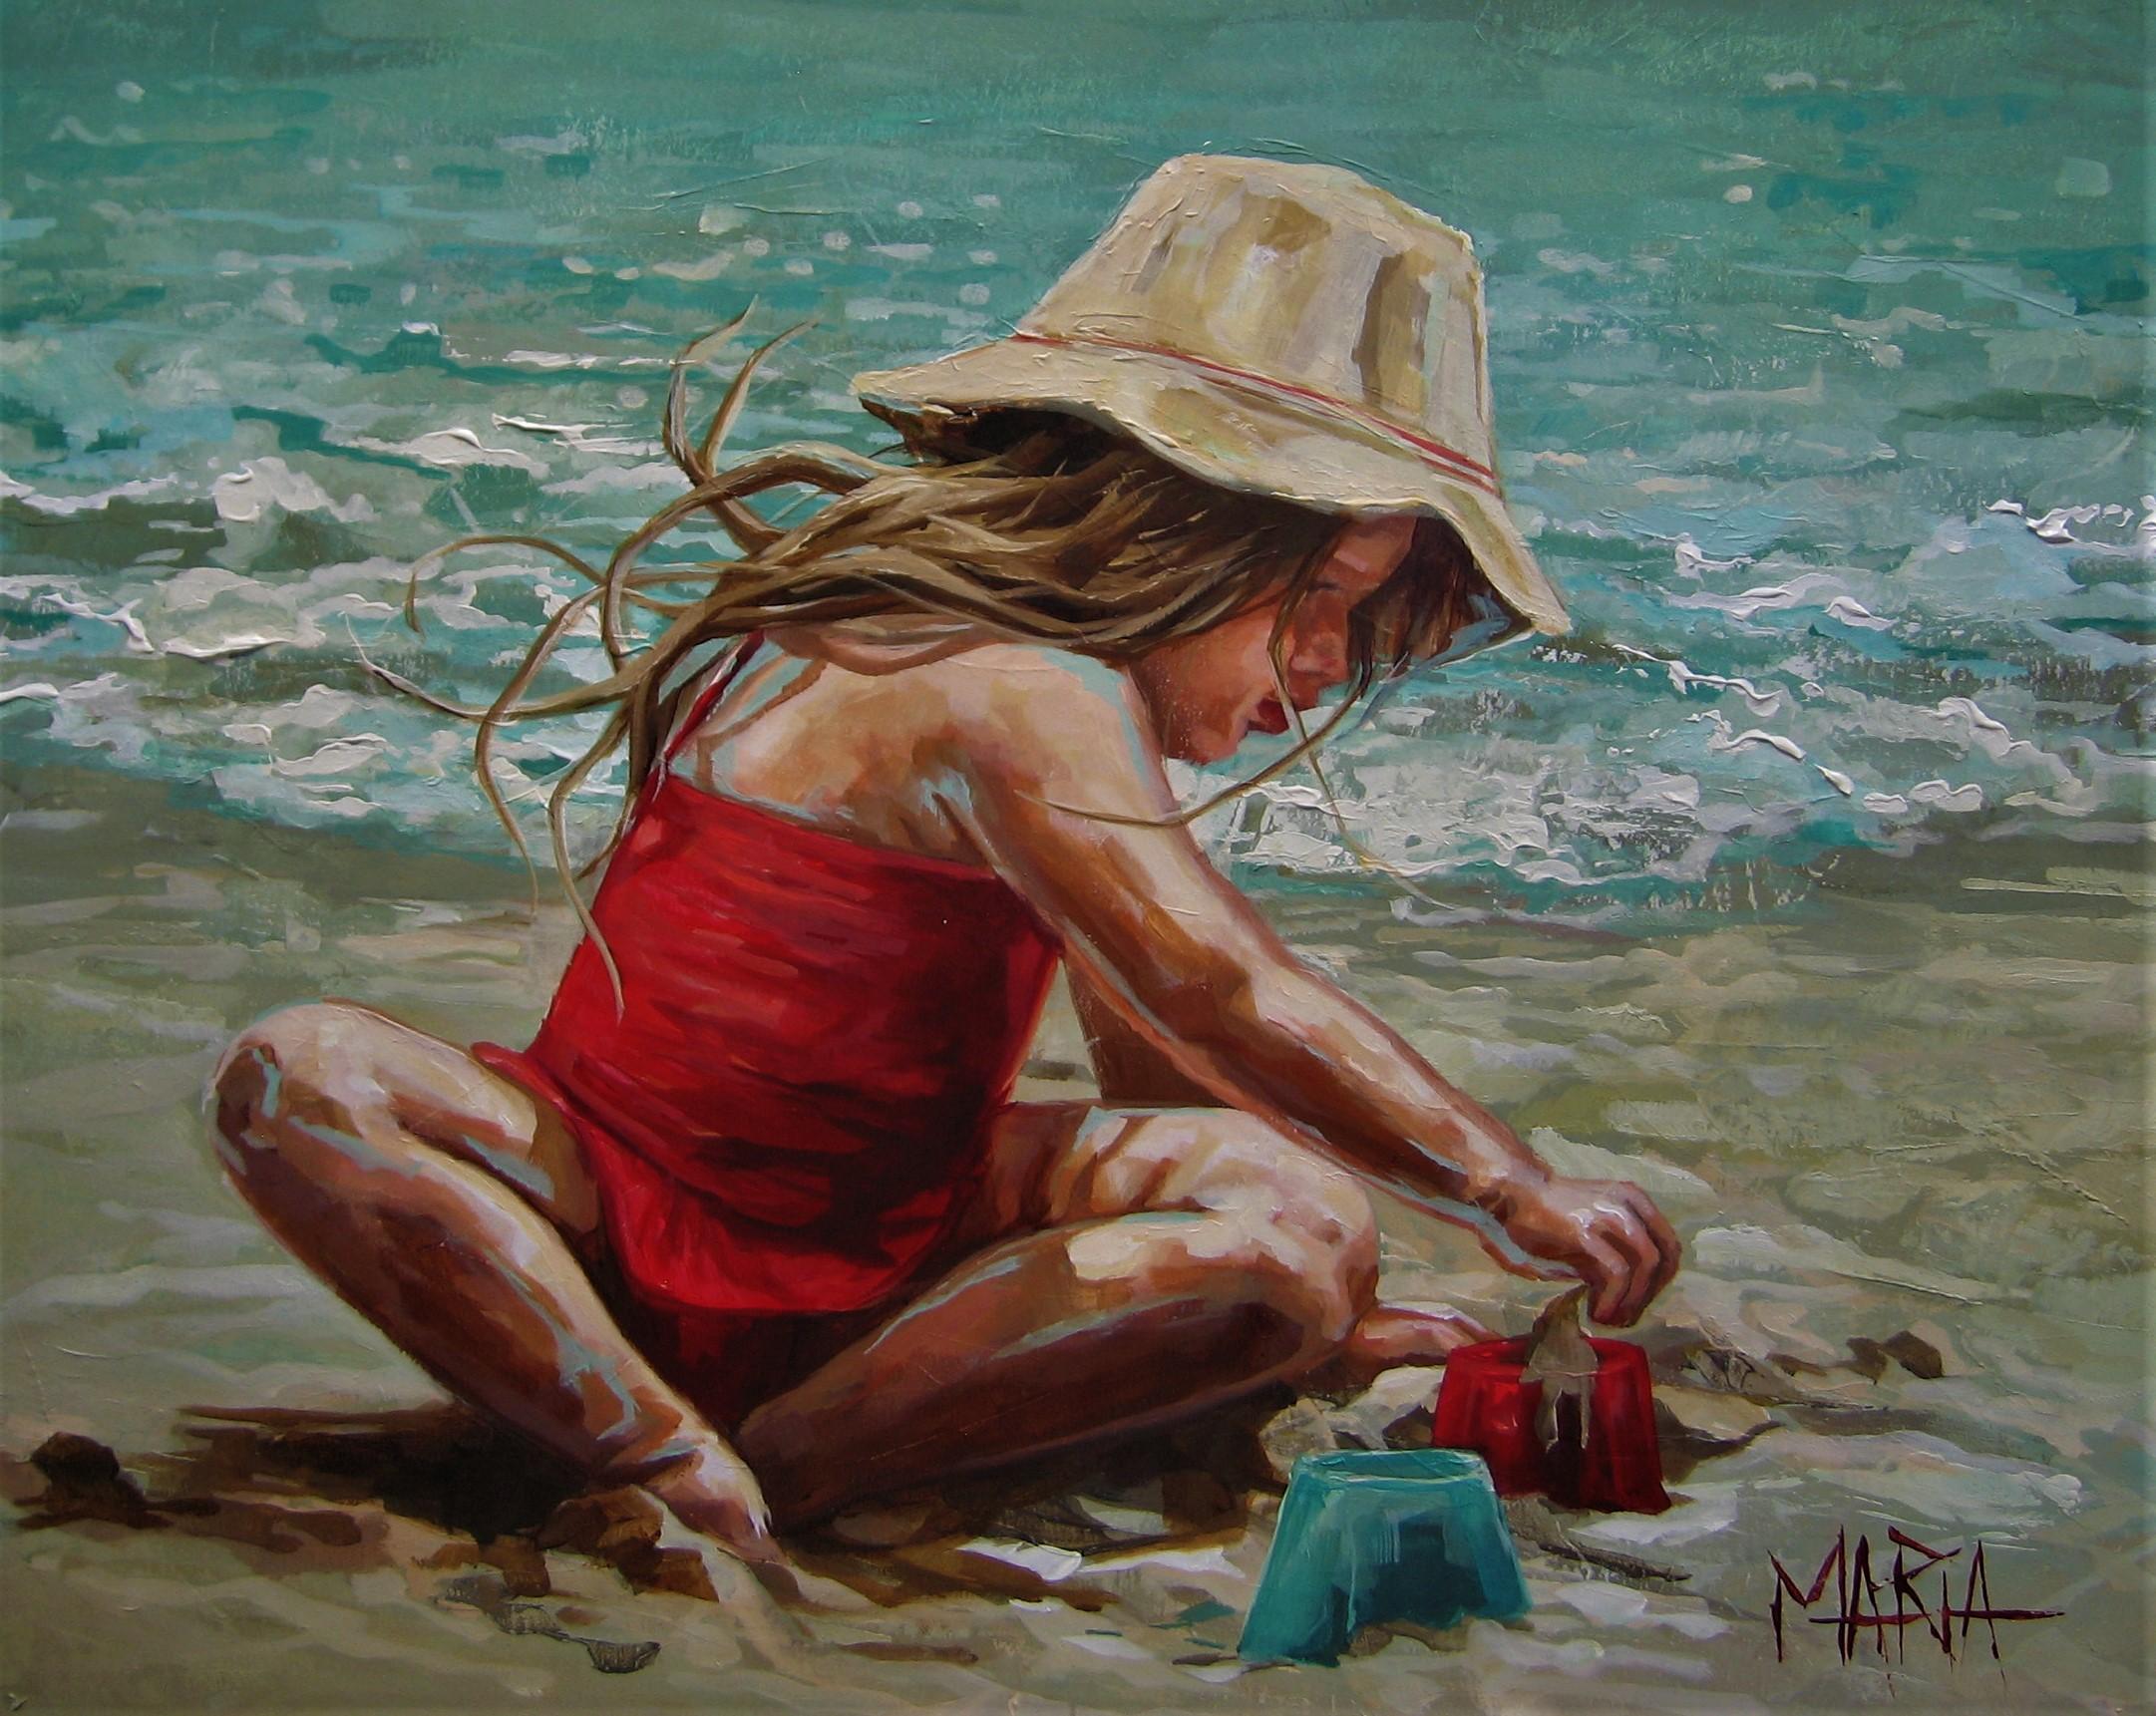 maria, maria art, maria art for sale, maria mosselbay, maria acrylic, maria gallery, crouse art gallery, art gallery, art for sale